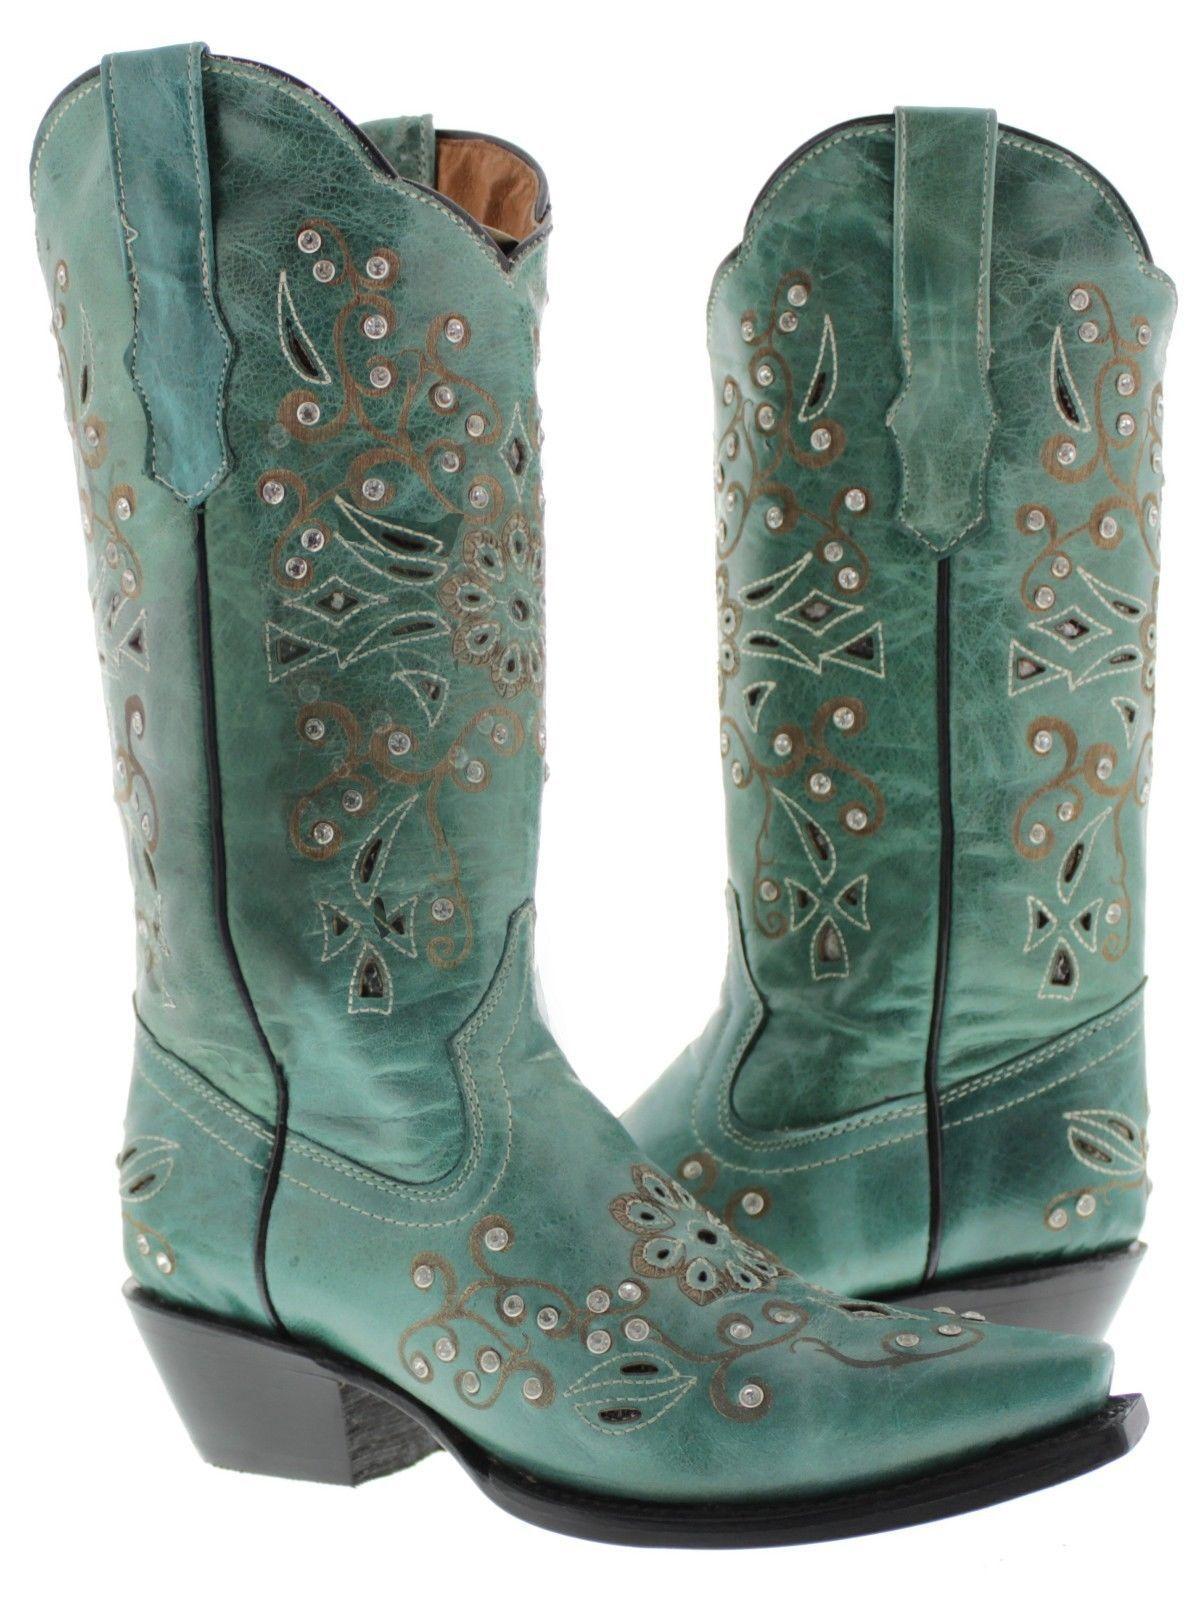 Donna Turquoise Python Rhinestone Western Pelle Cowboy Stivali Rodeo Cowgirl